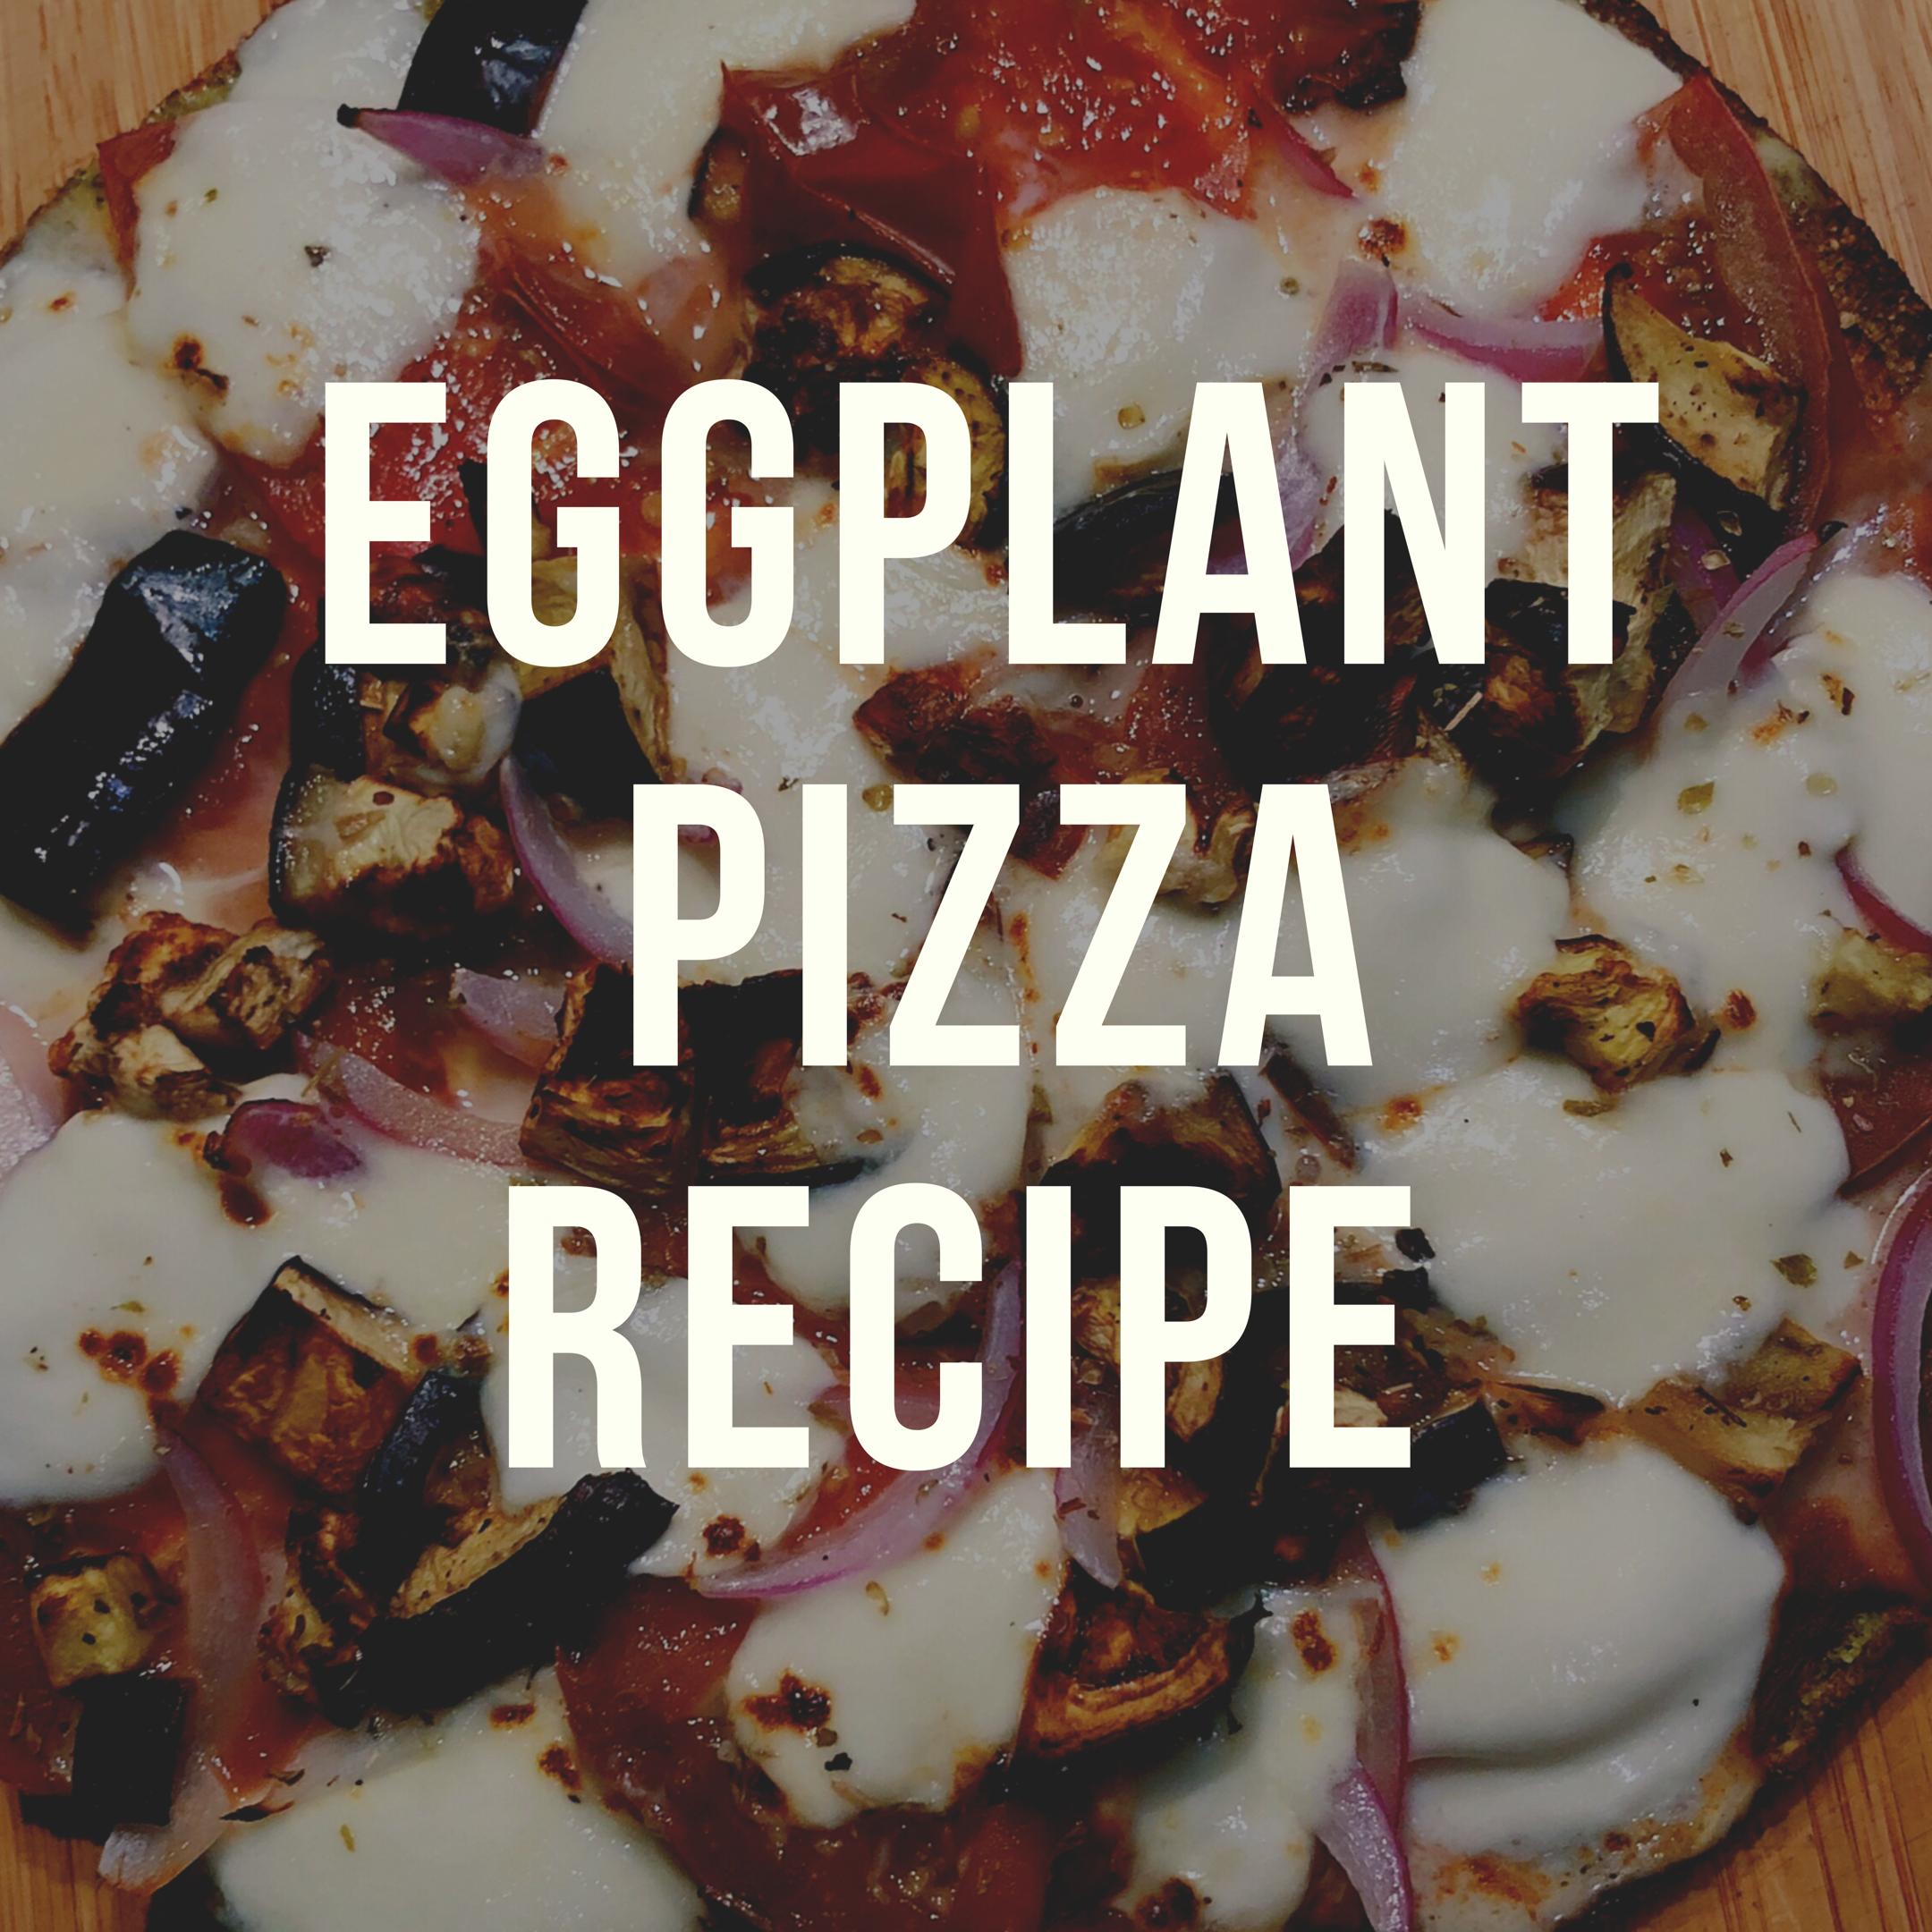 eggplant pizza.png